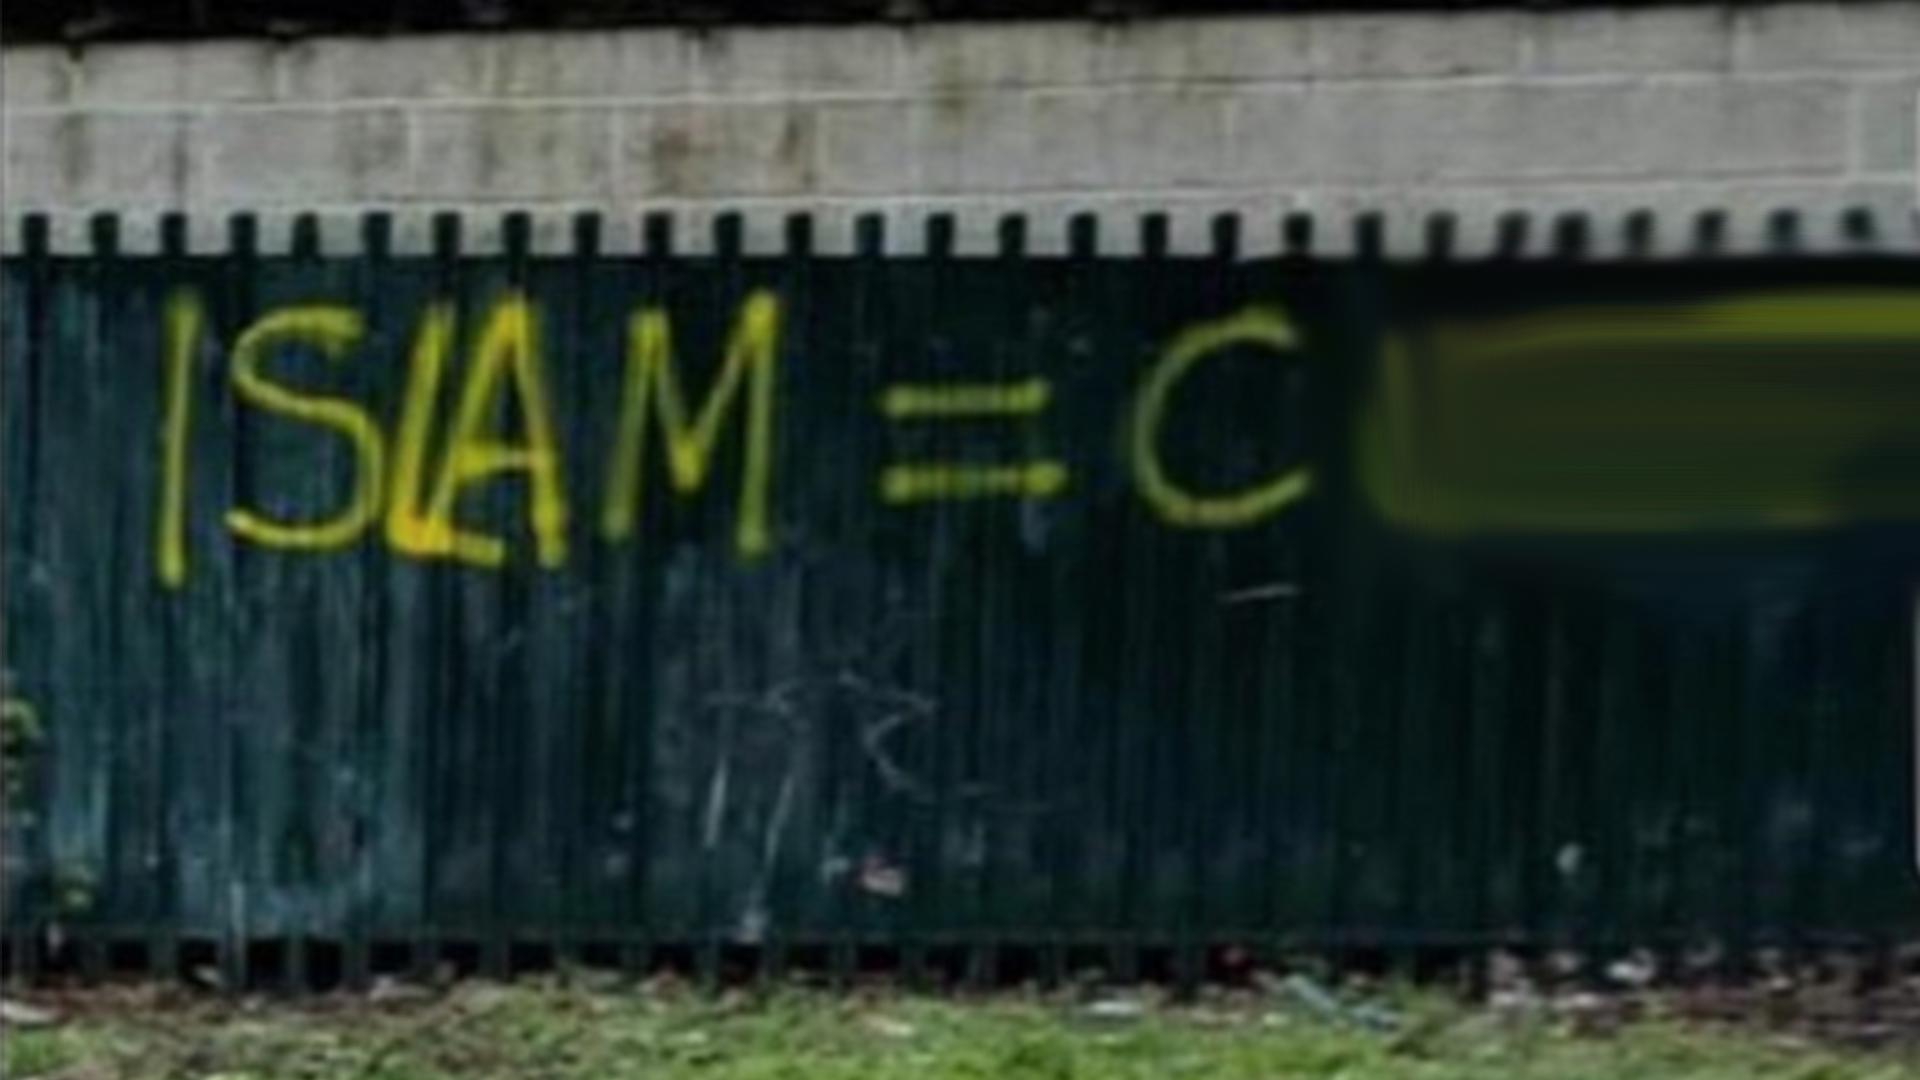 "Birmingham community in shock over racist graffiti – ""Islam = C***"""